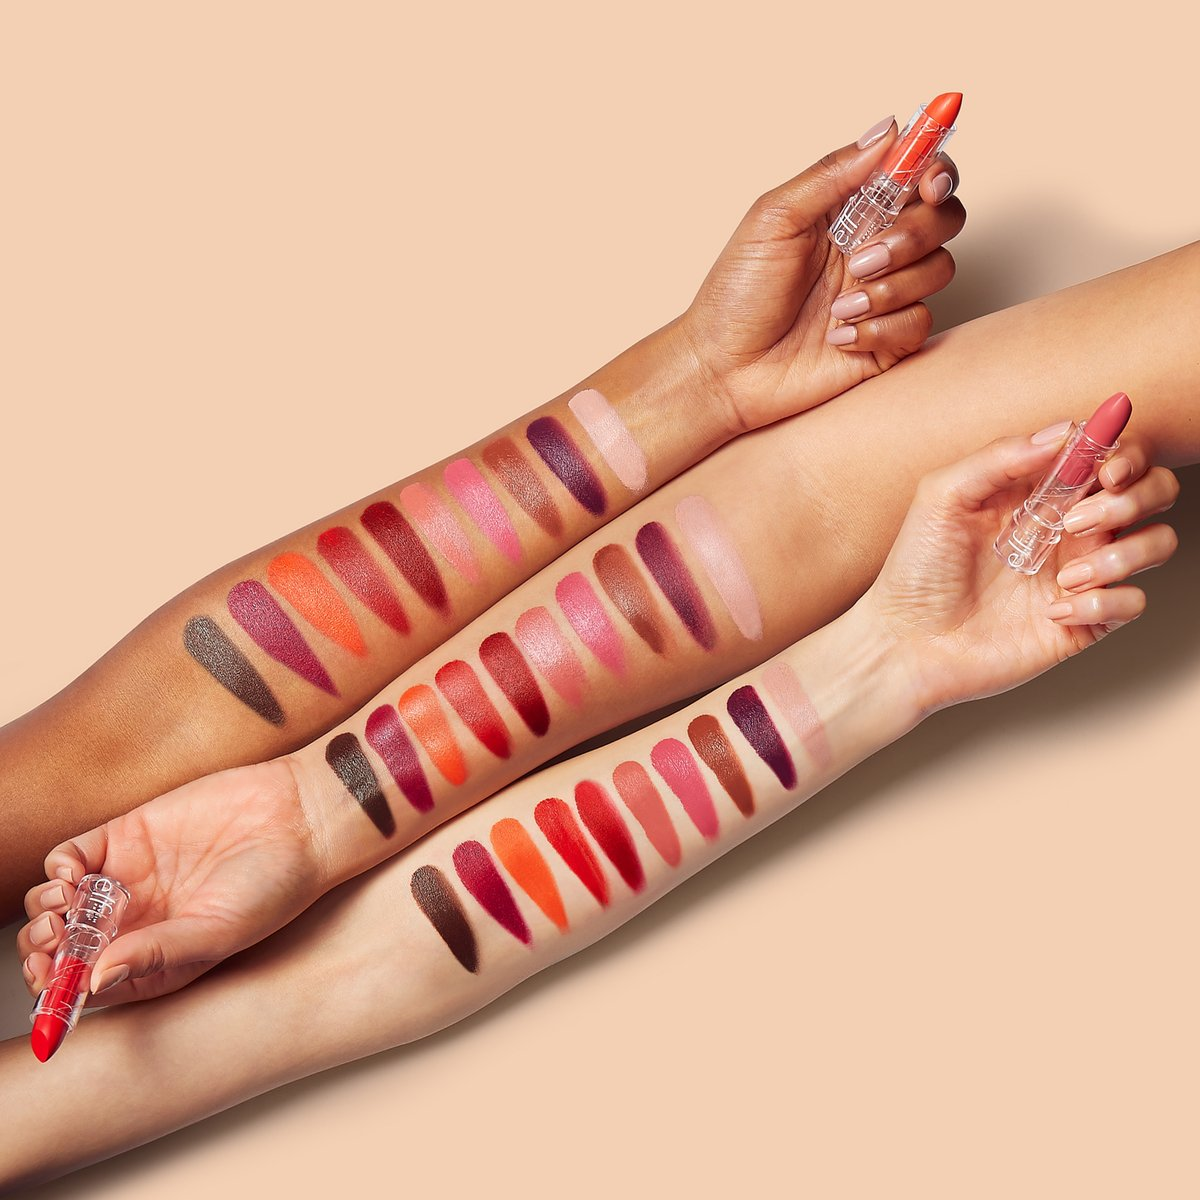 e.l.f. Cosmetics SRSLY Satin Lipstick